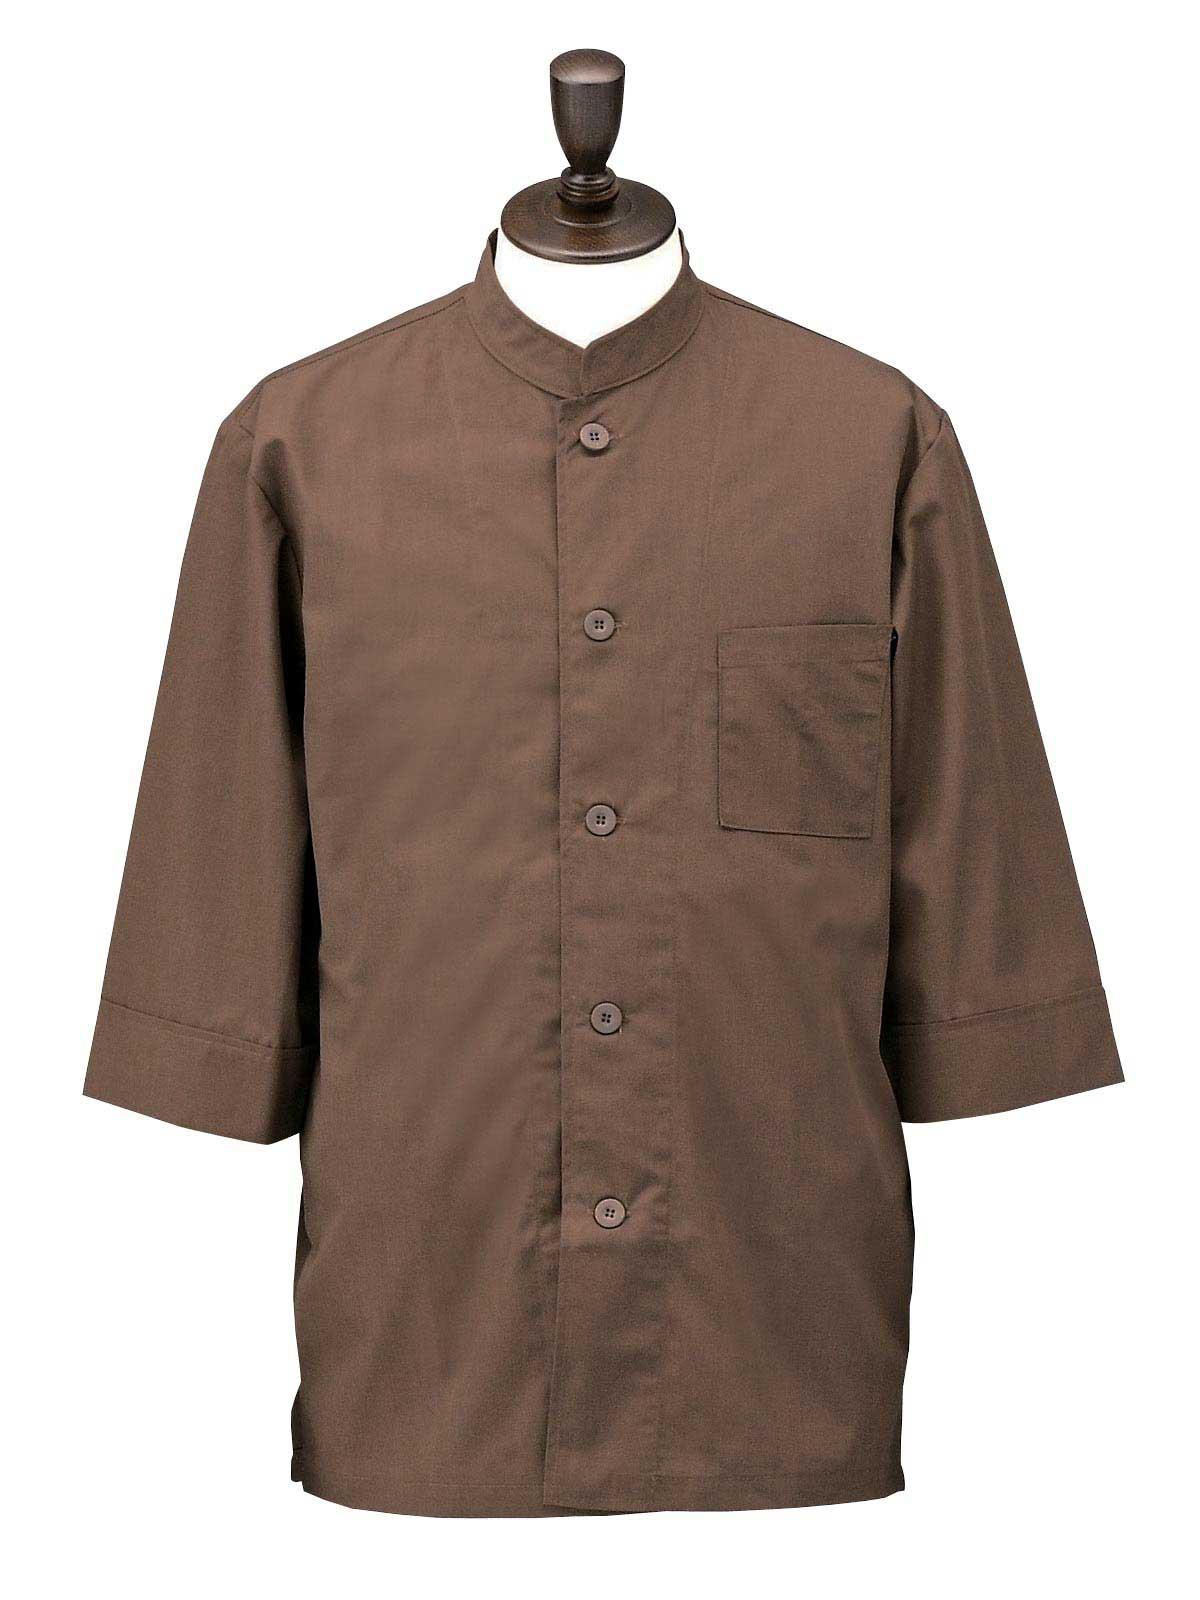 SBK3800 4.ブラウン コックシャツ・ダブル 男女兼用